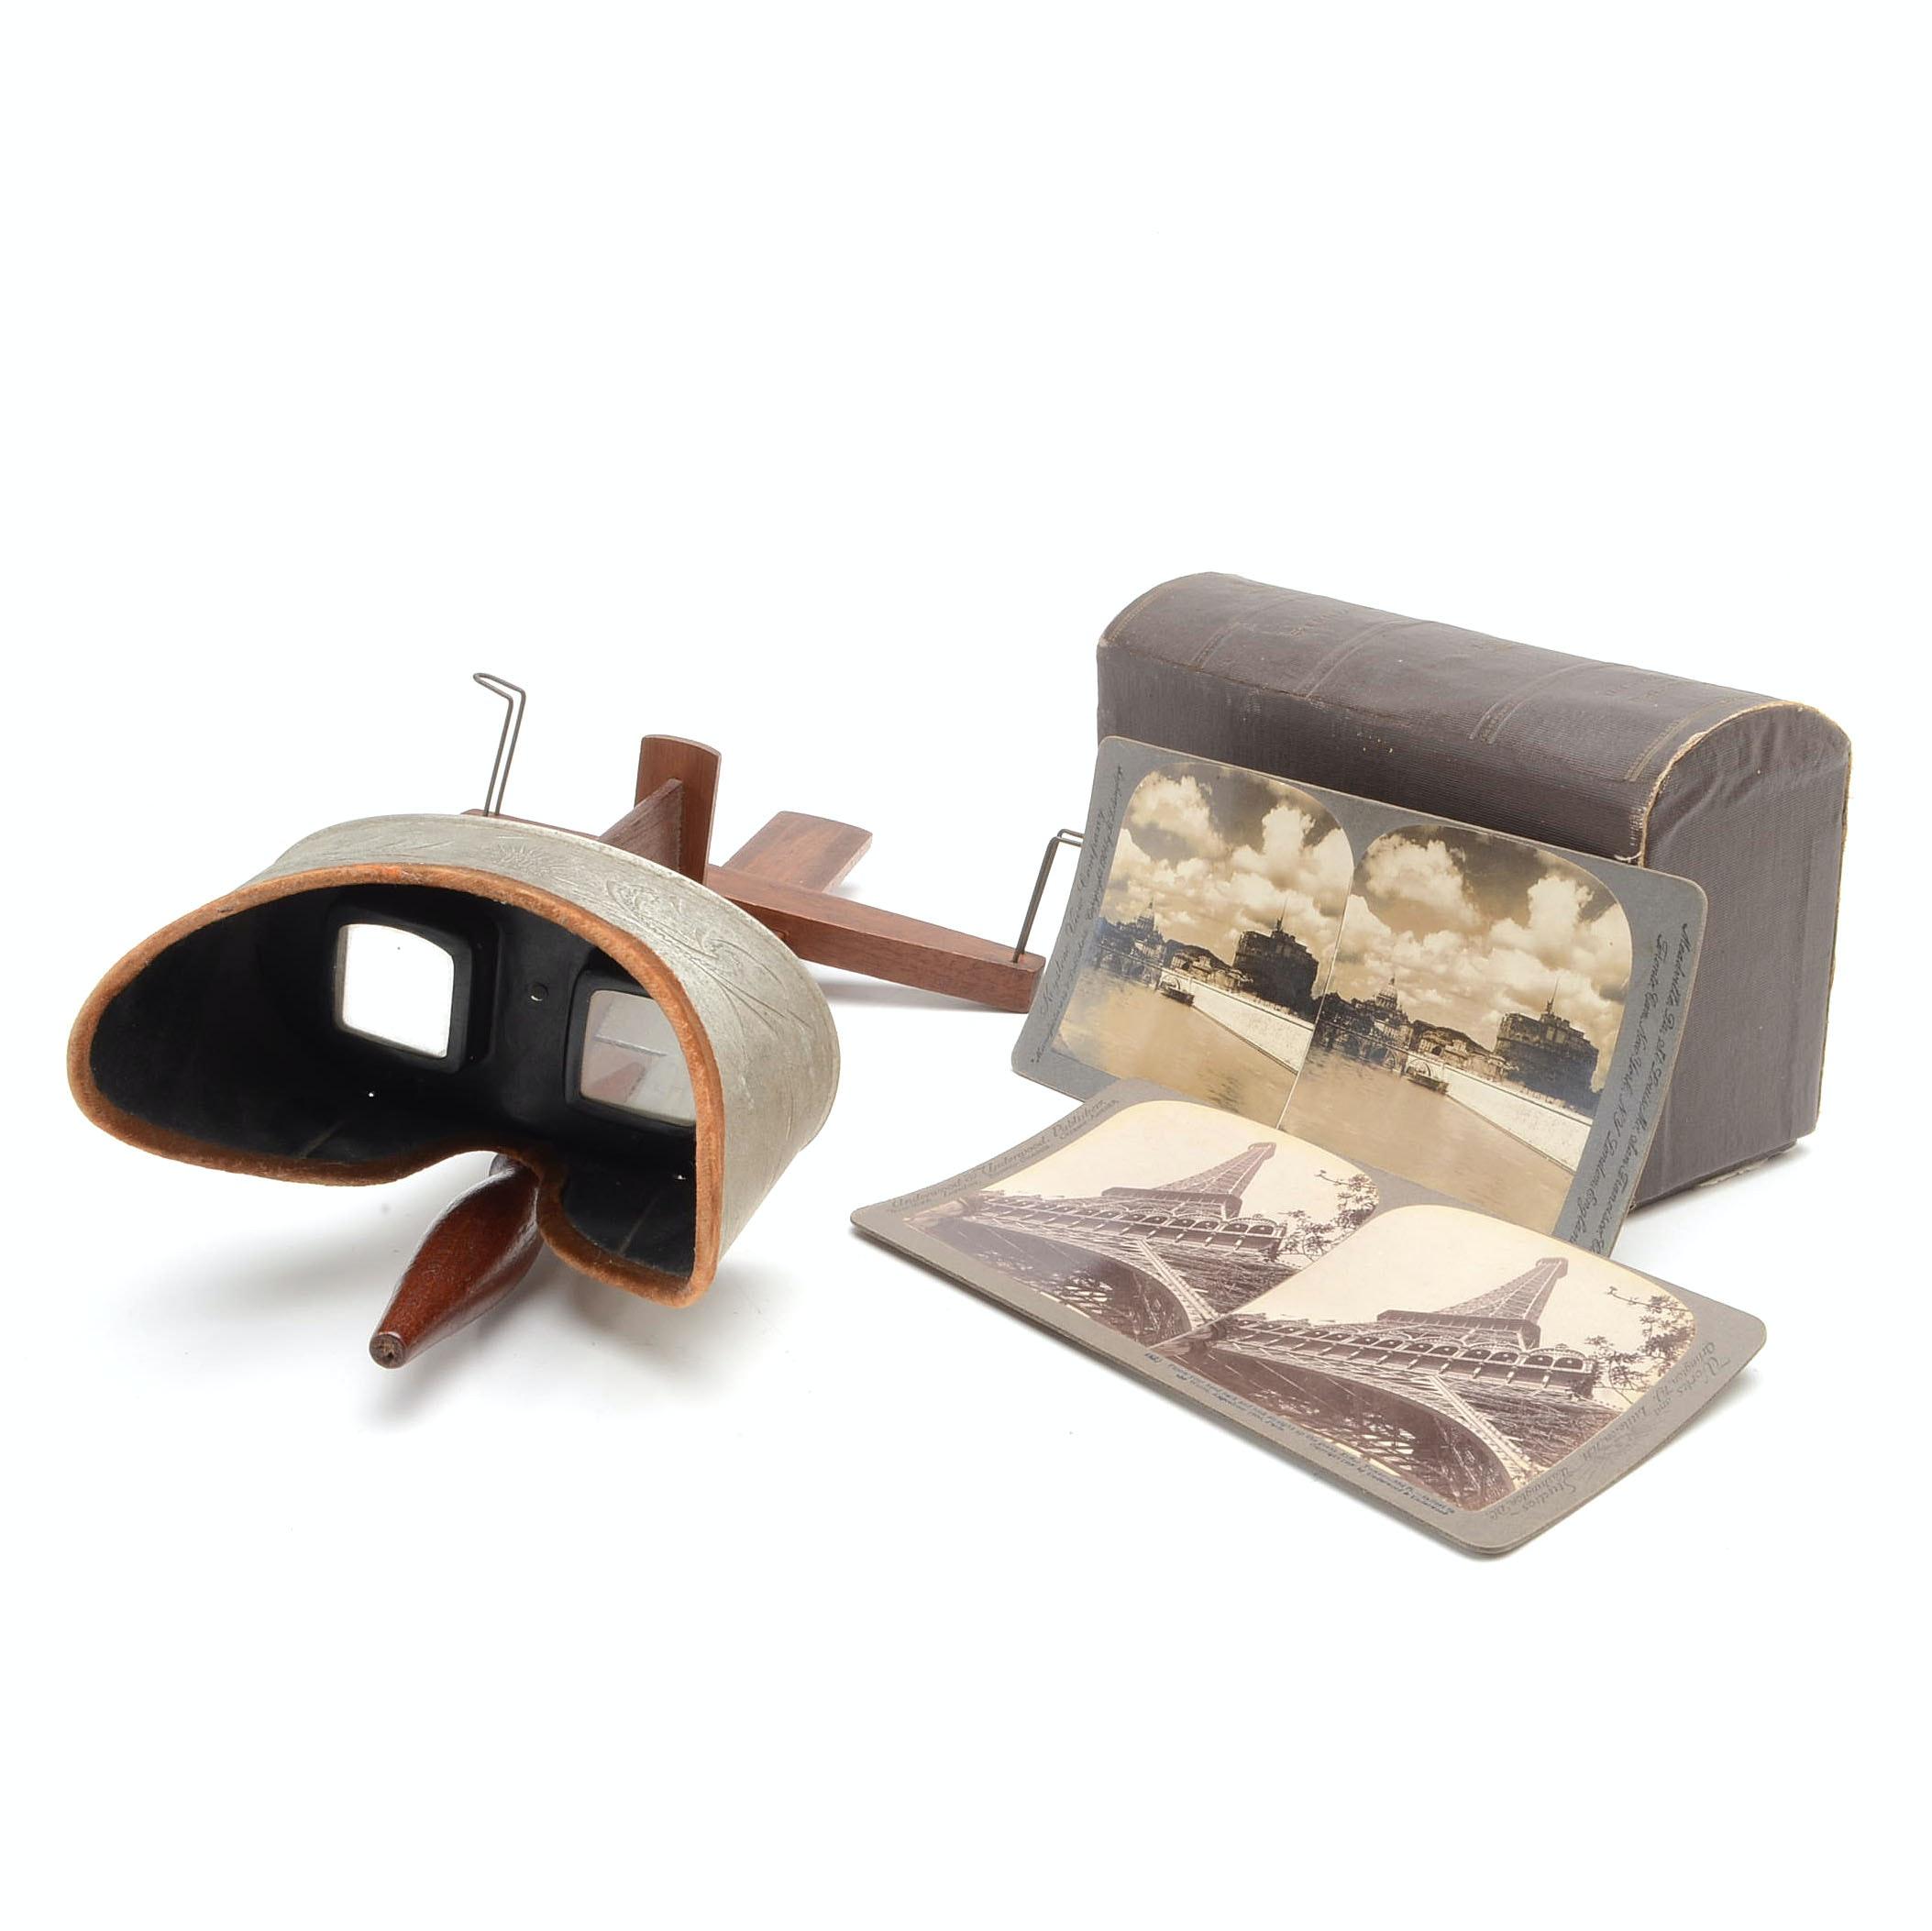 Antique Underwood & Underwood Stereoscope and Slides